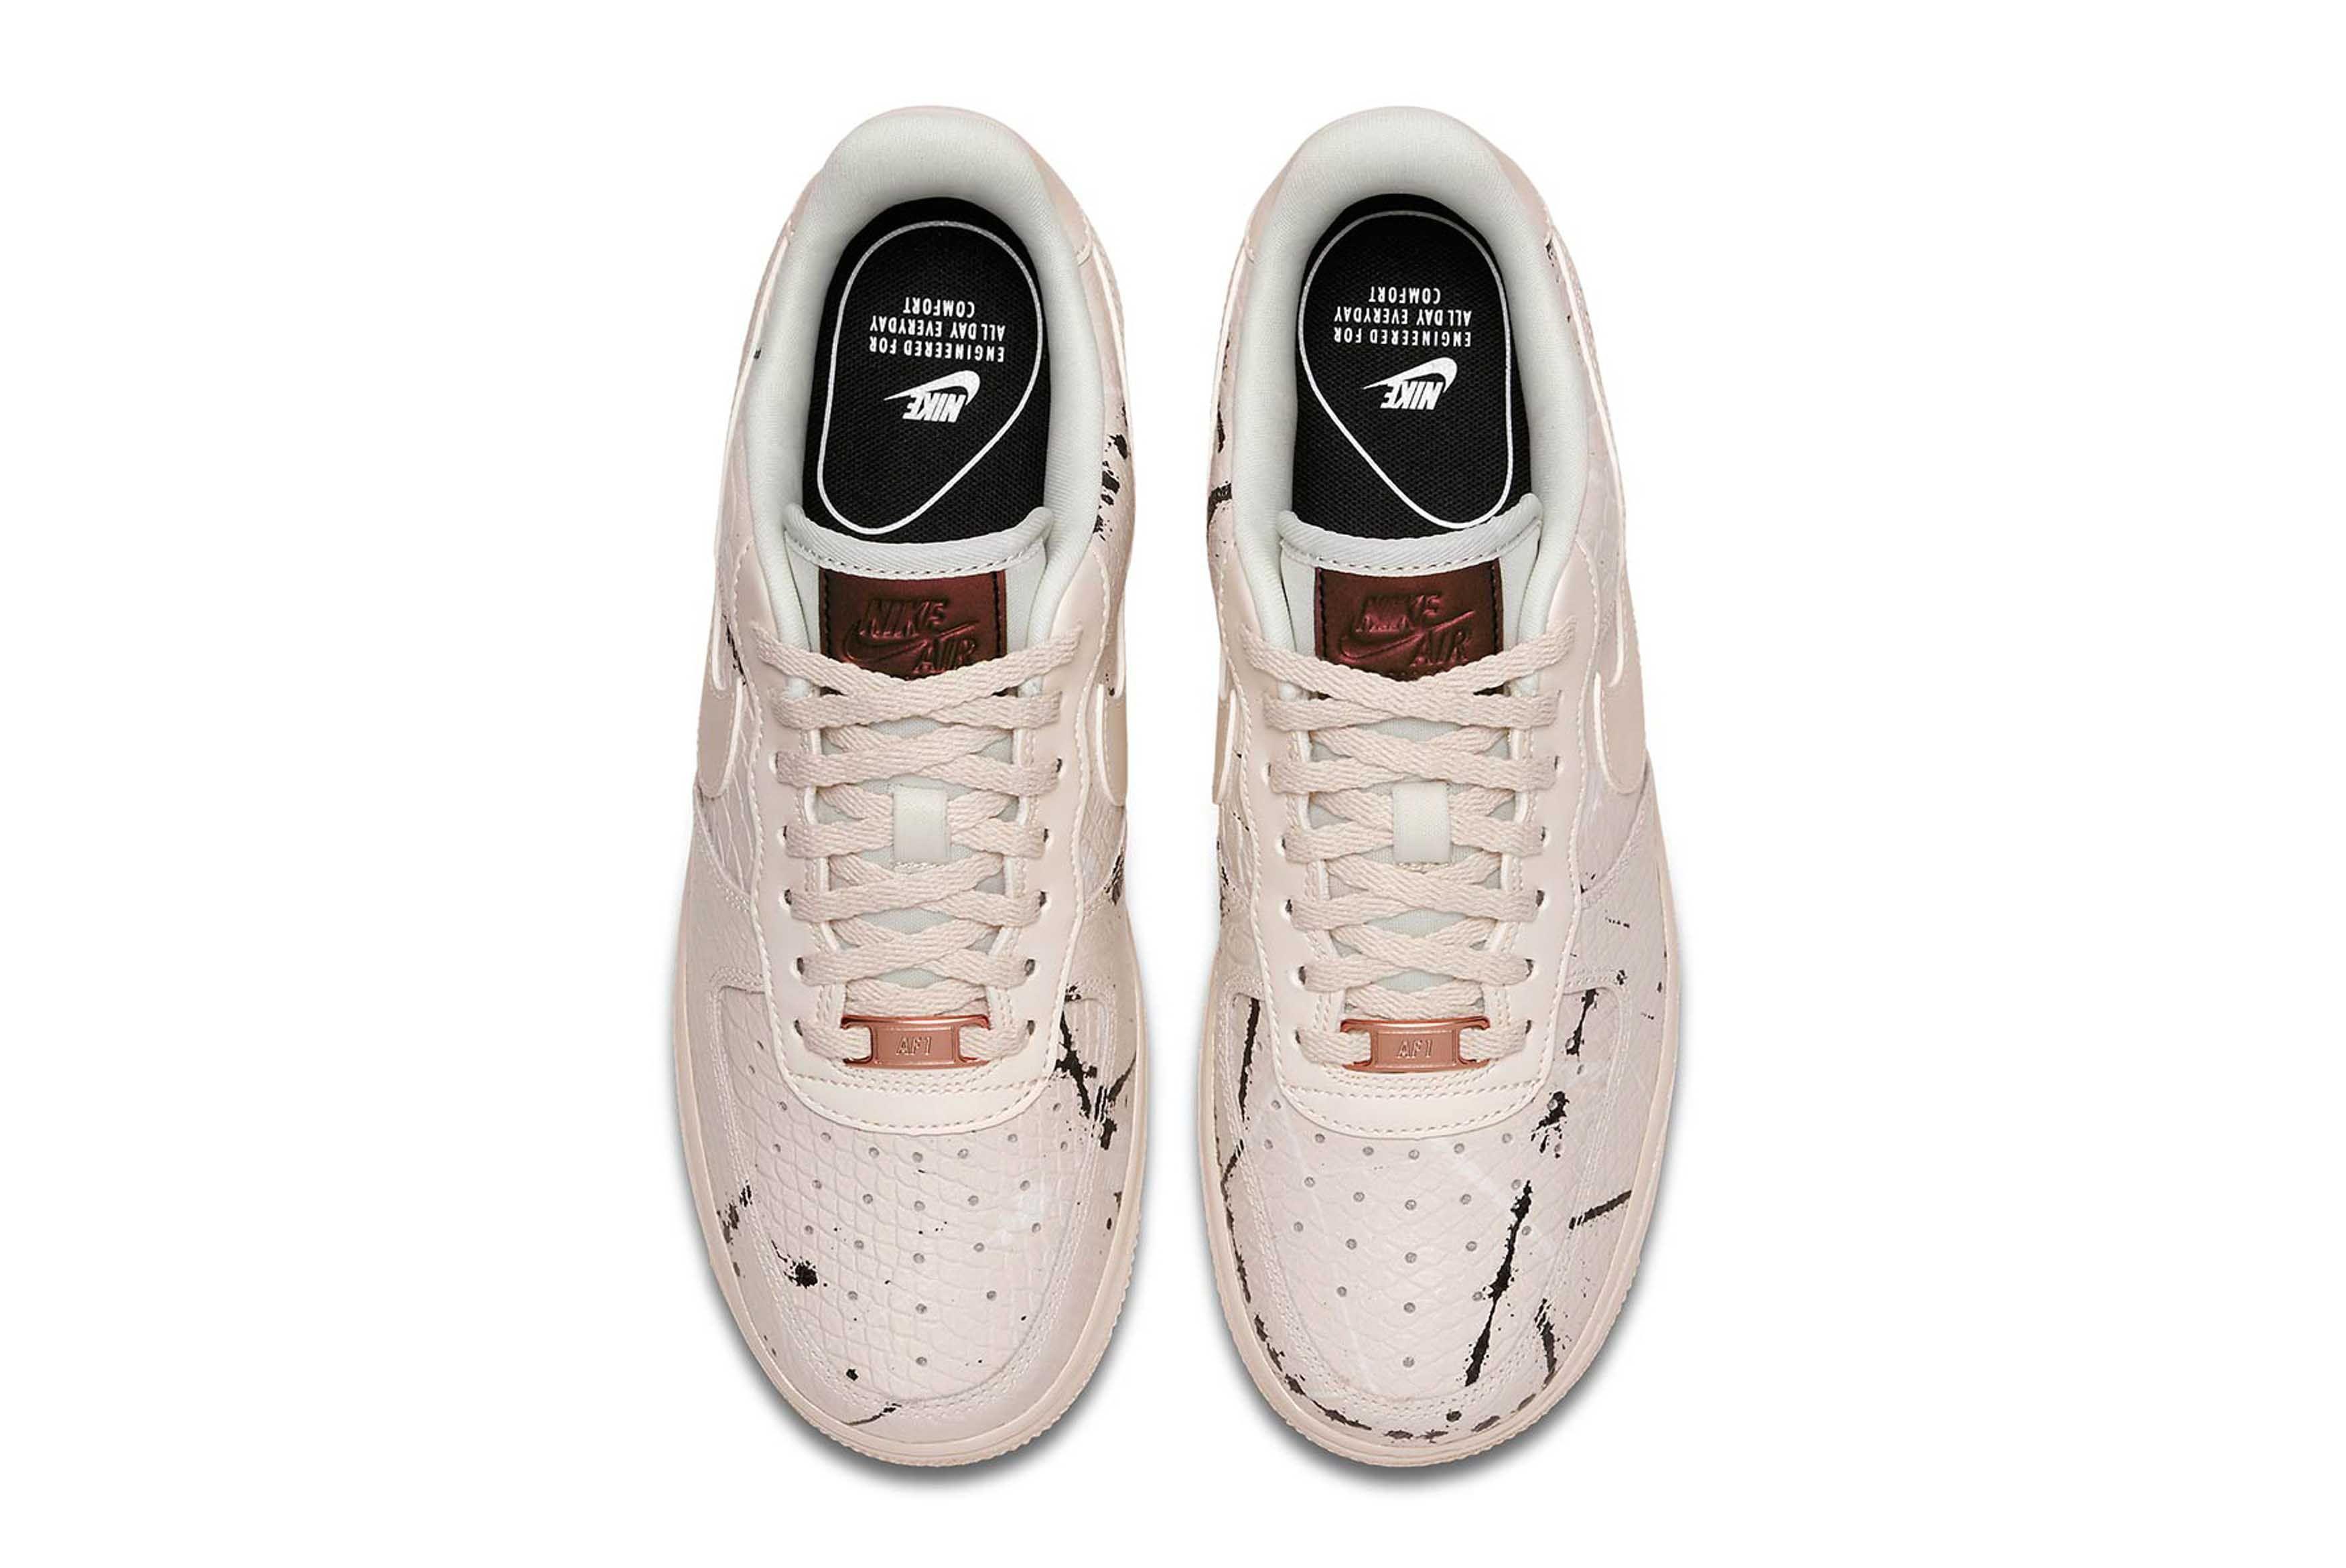 Nike Air Force 1 Low Phantom Snakeskin Release 4 Sneaker Freaker